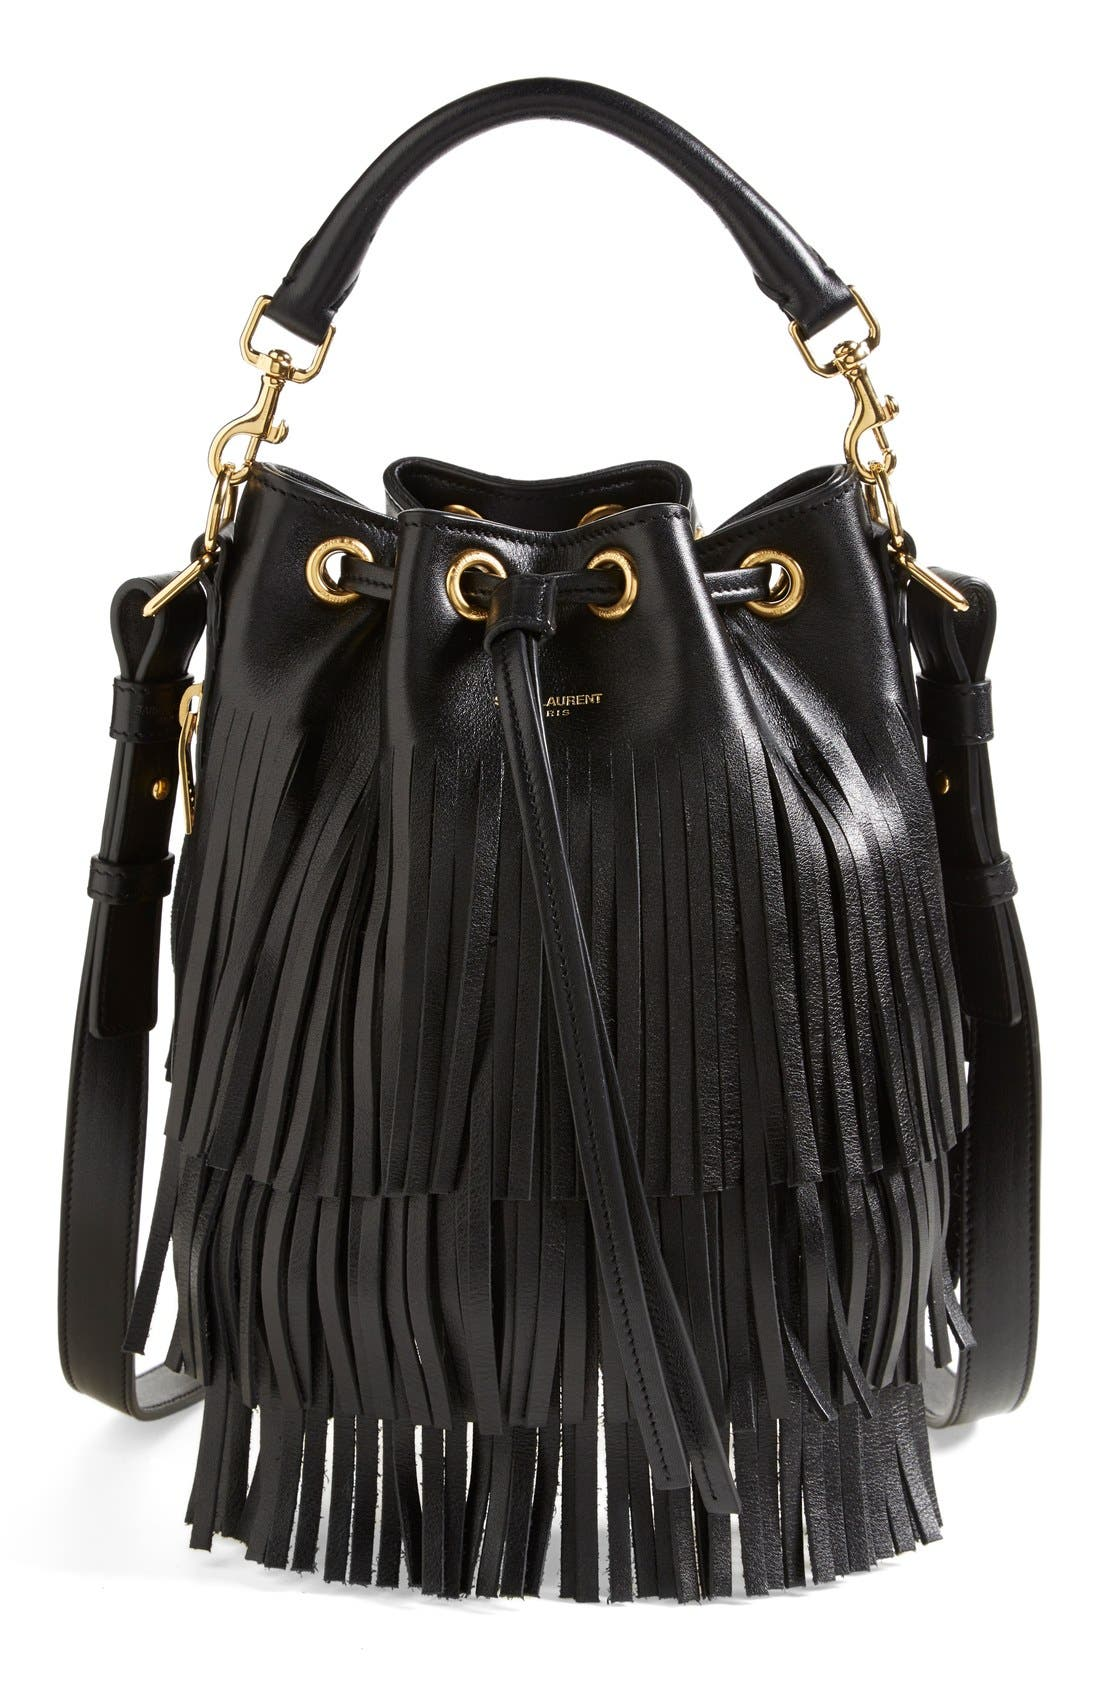 Alternate Image 1 Selected - Saint Laurent 'Small' Bucket Bag